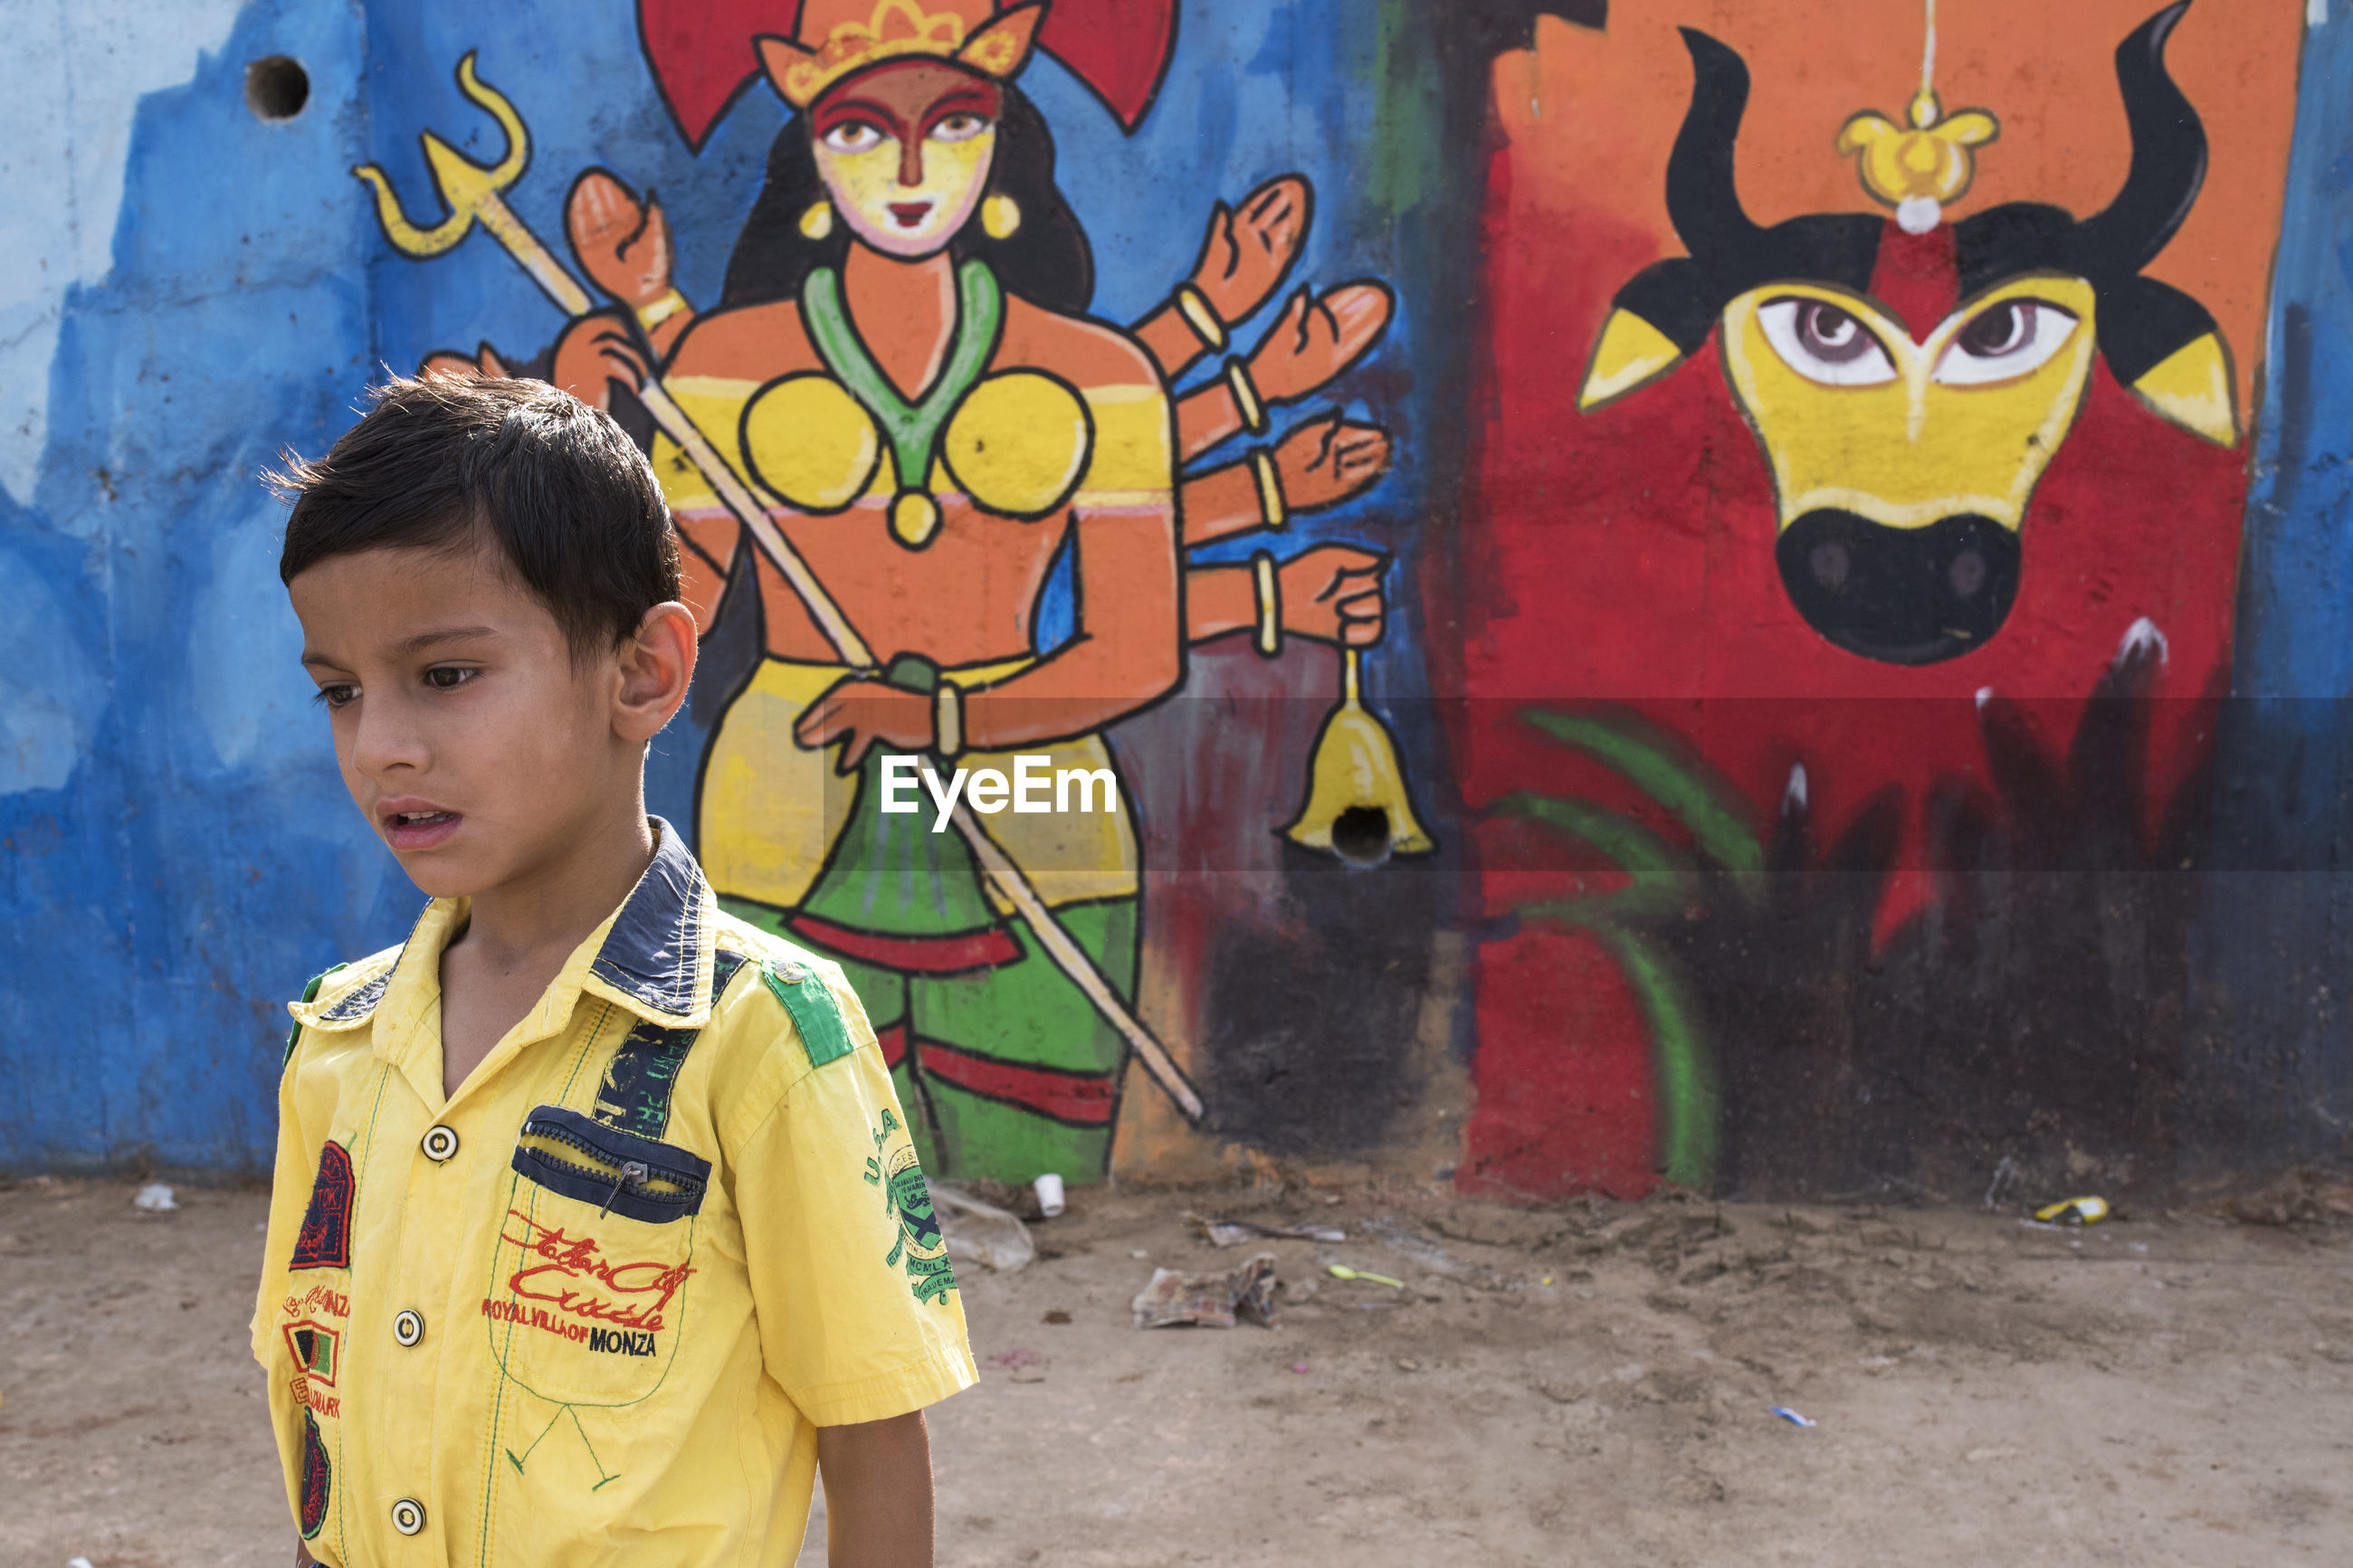 FULL LENGTH OF BOY STANDING IN MULTI COLORED GRAFFITI